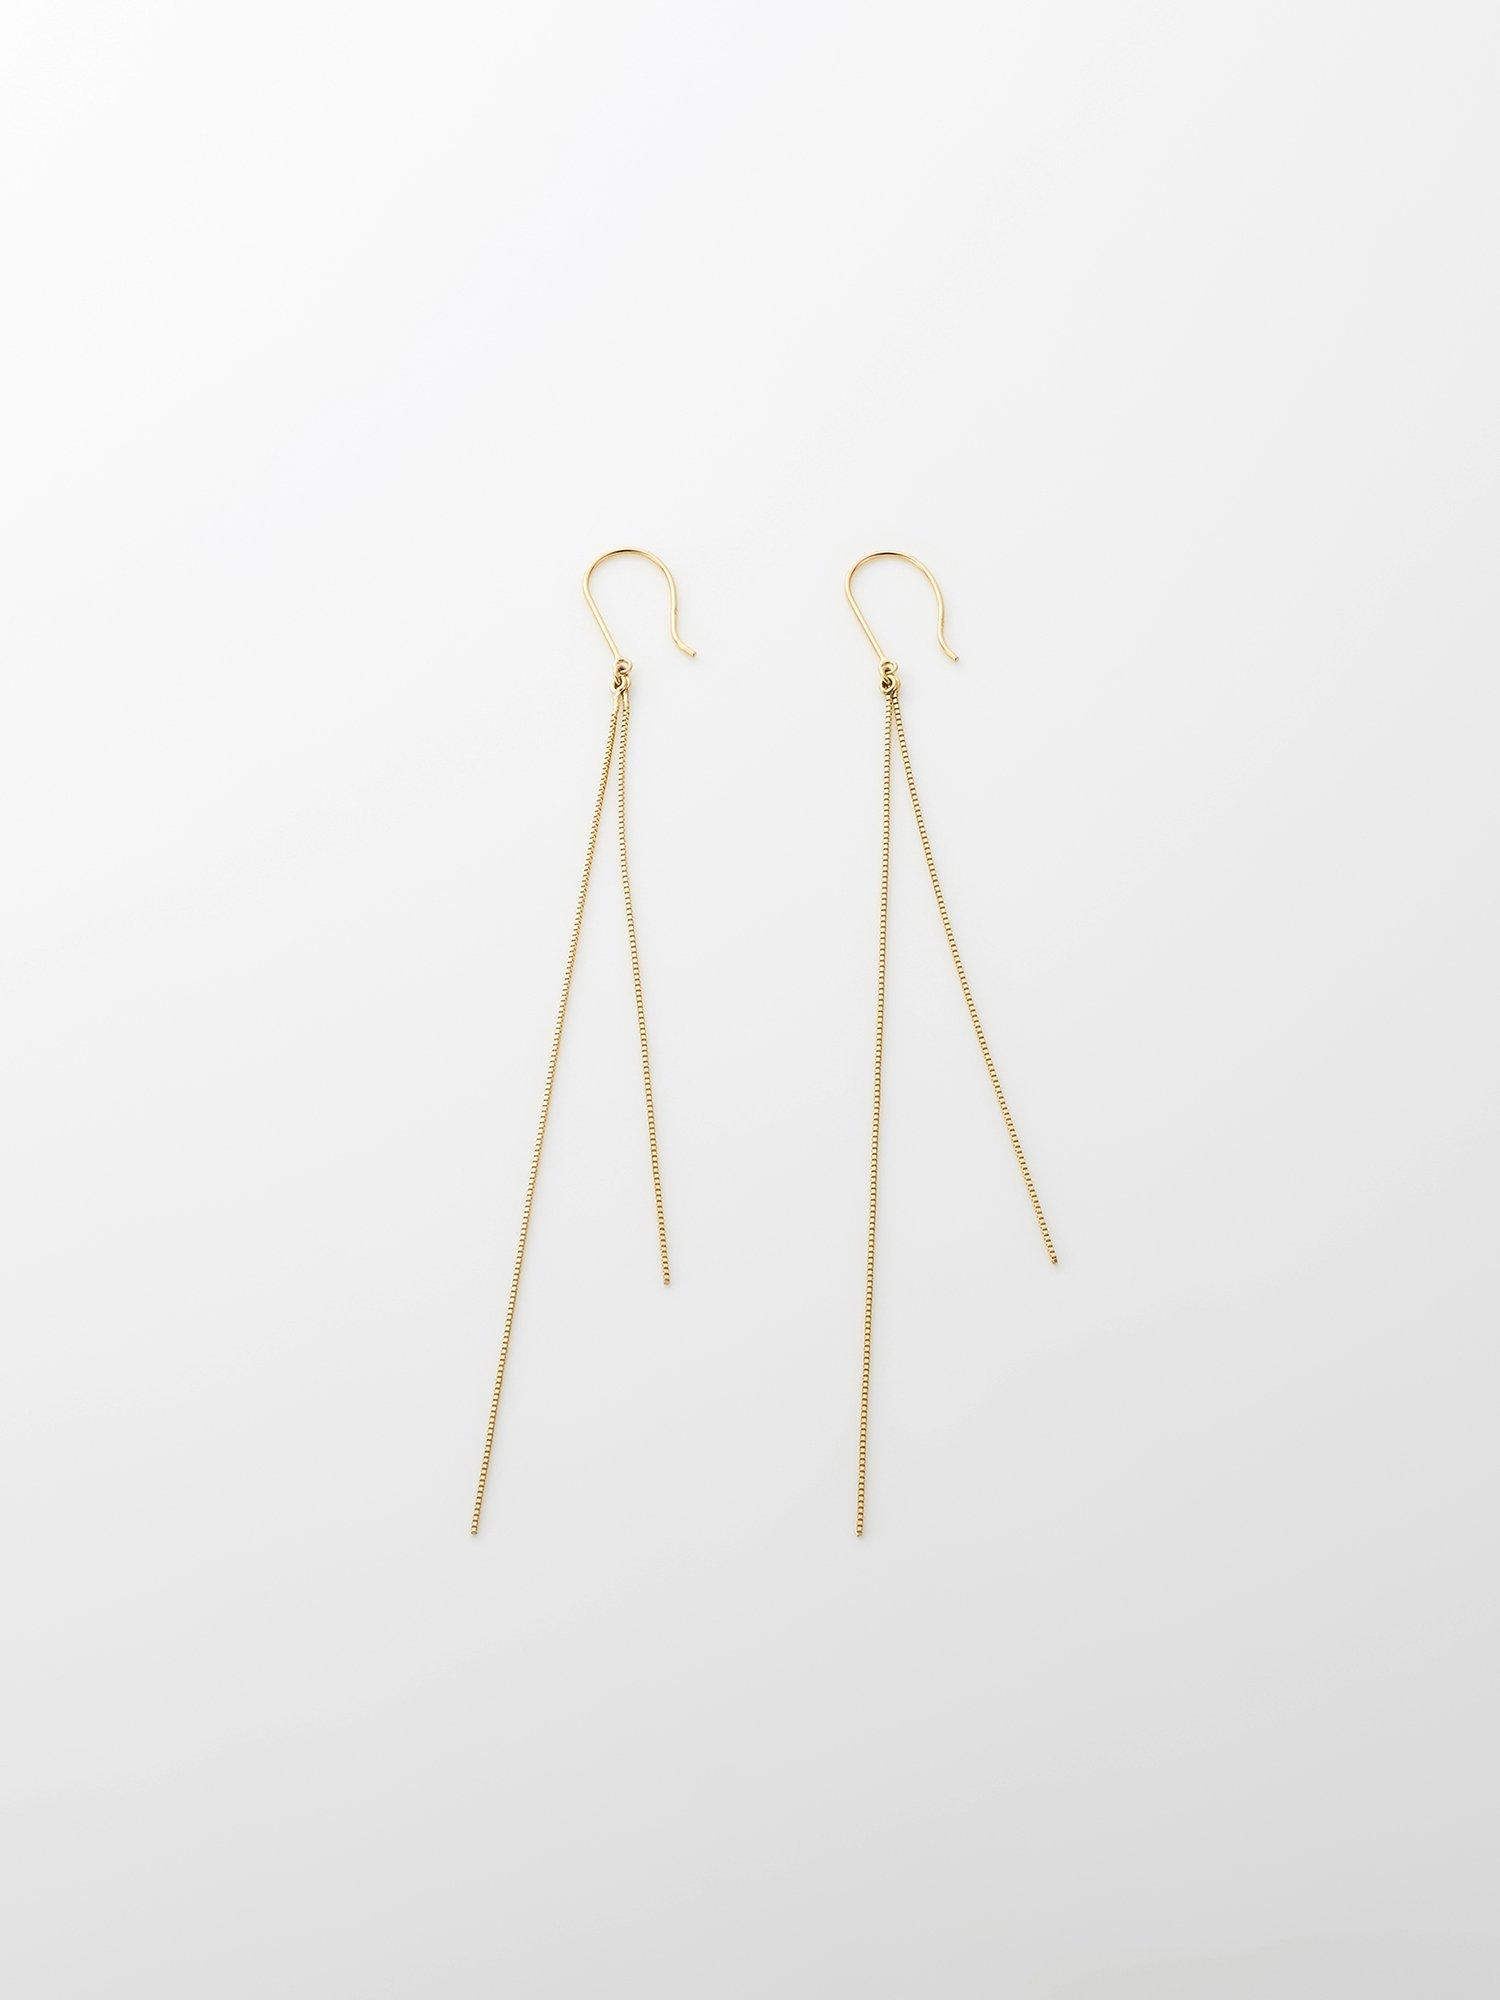 SOPHISTICATED VINTAGE / Gold line earrings / Short / 在庫商品